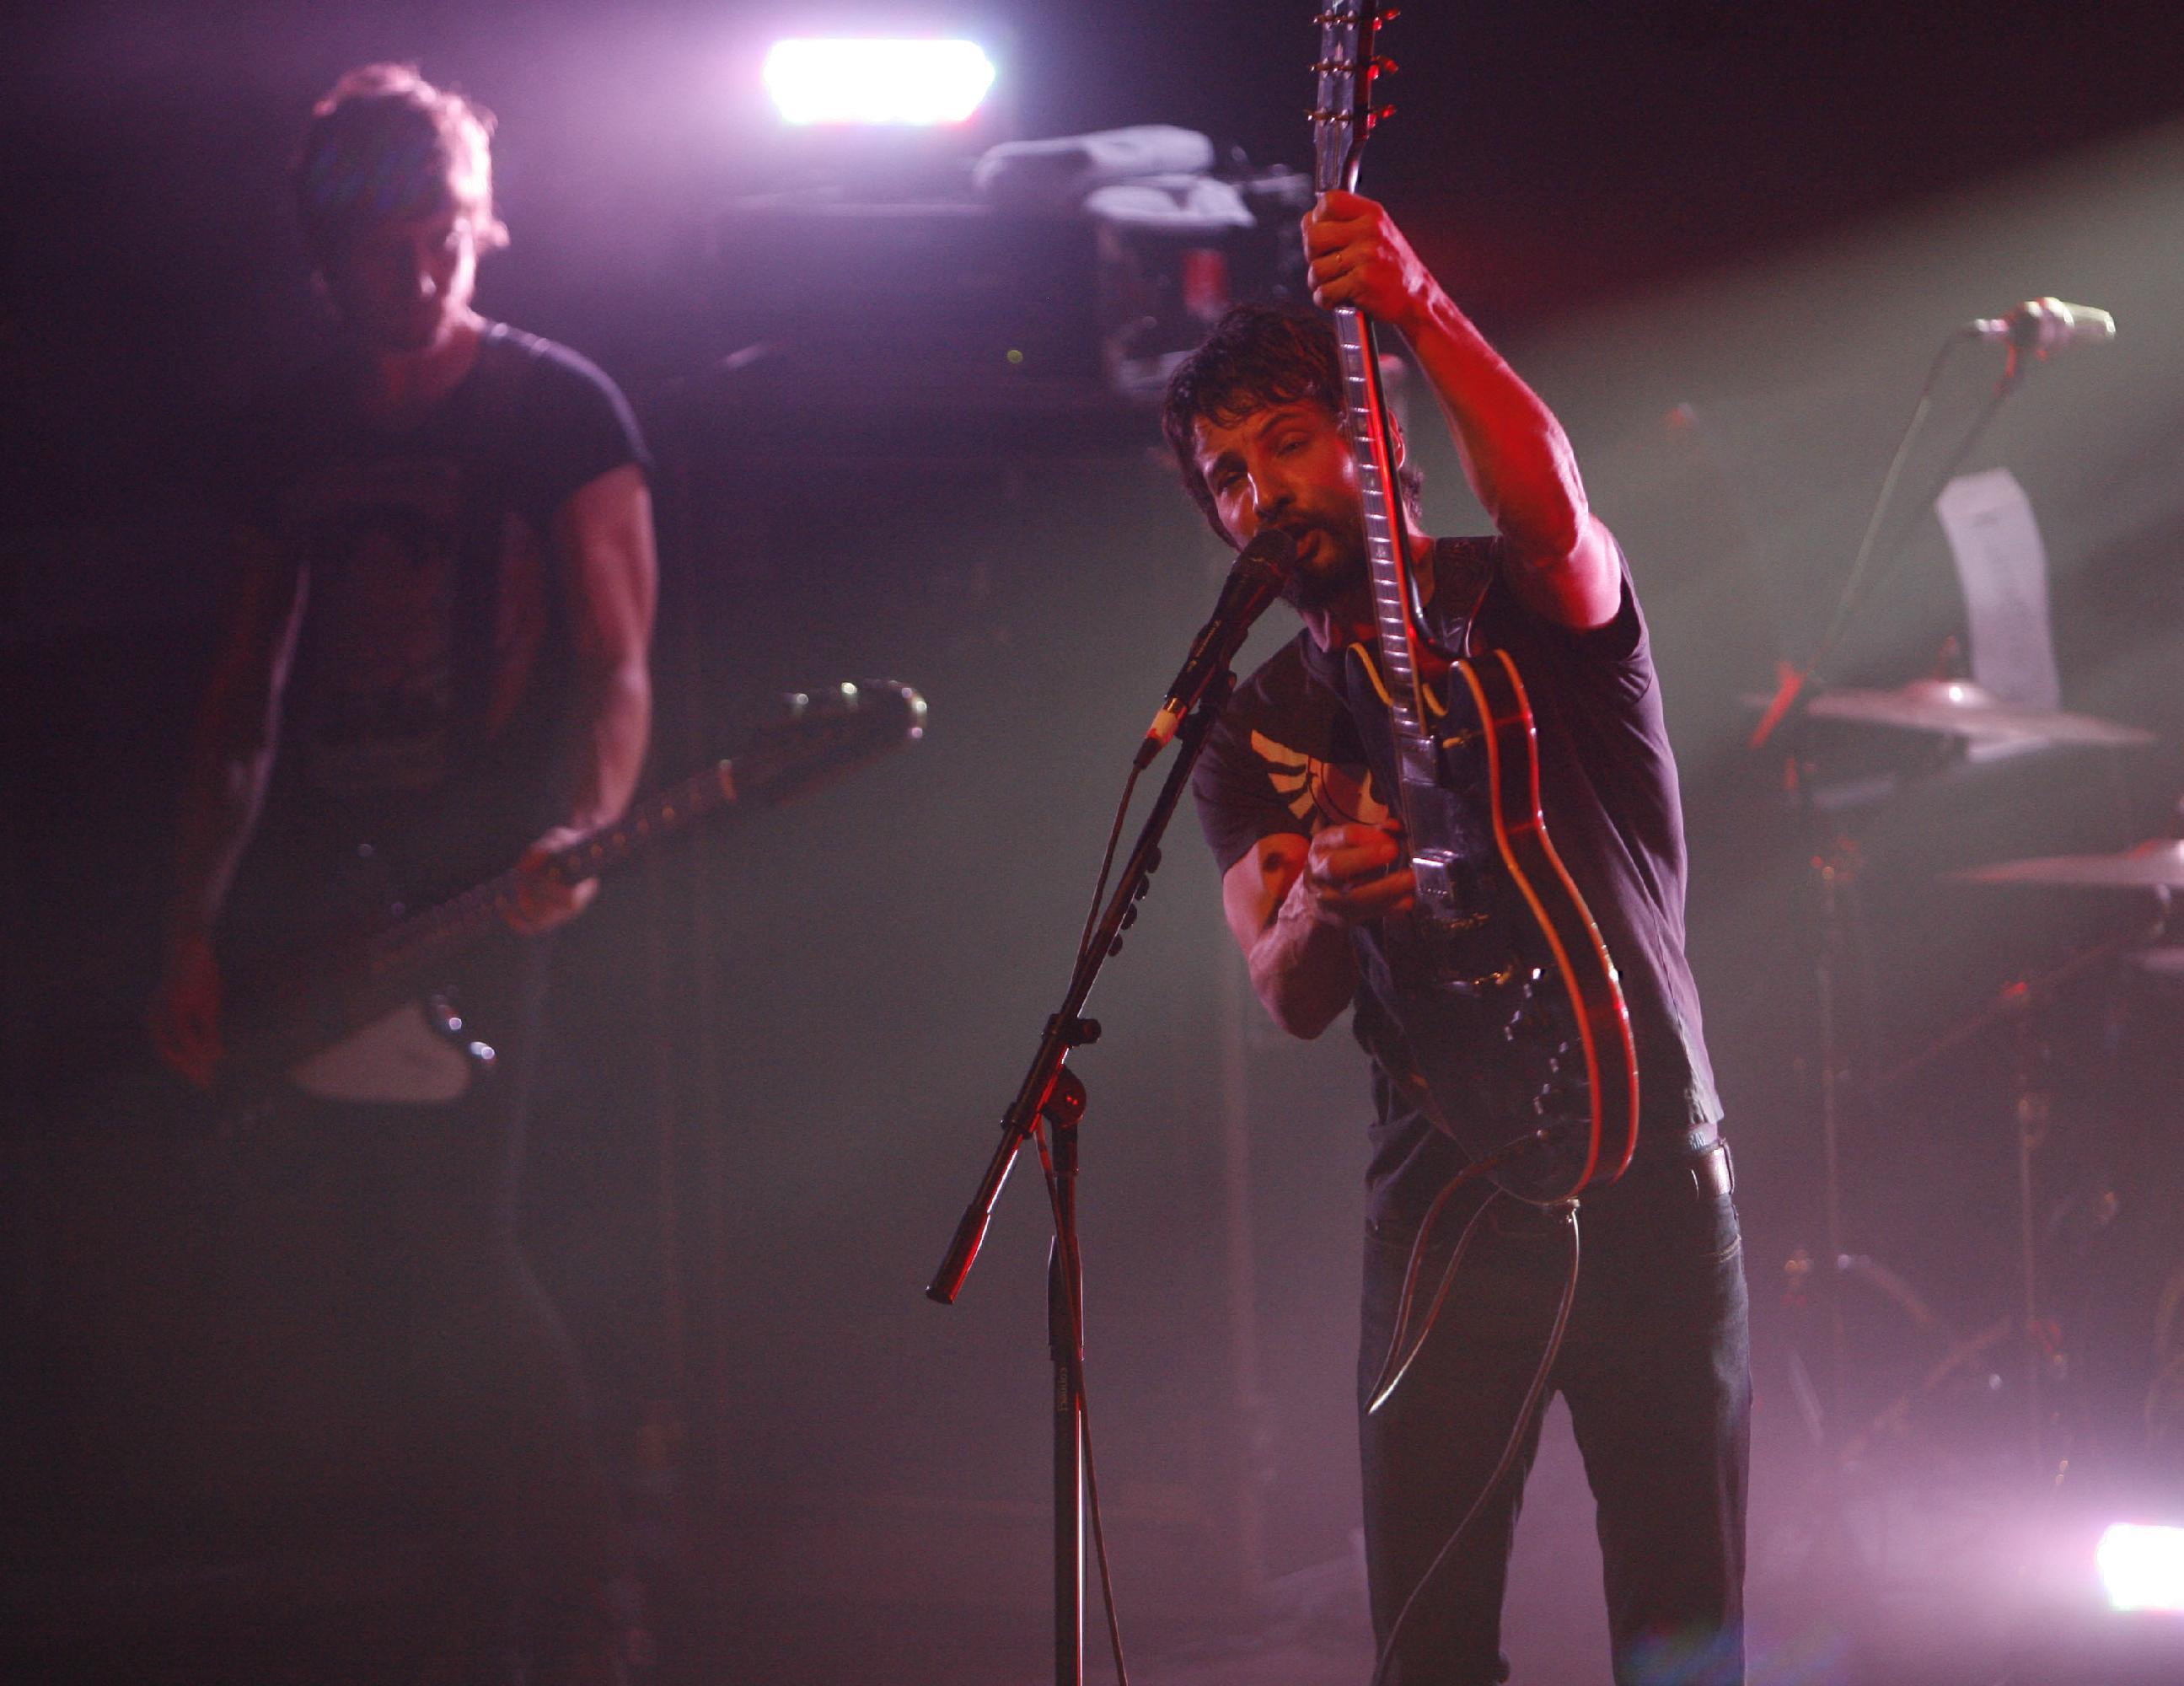 Sam Roberts Band, here performing at the Town Ballroom in 2008, will play Edgefest. (Sharon Cantillon/Buffalo News file photo)